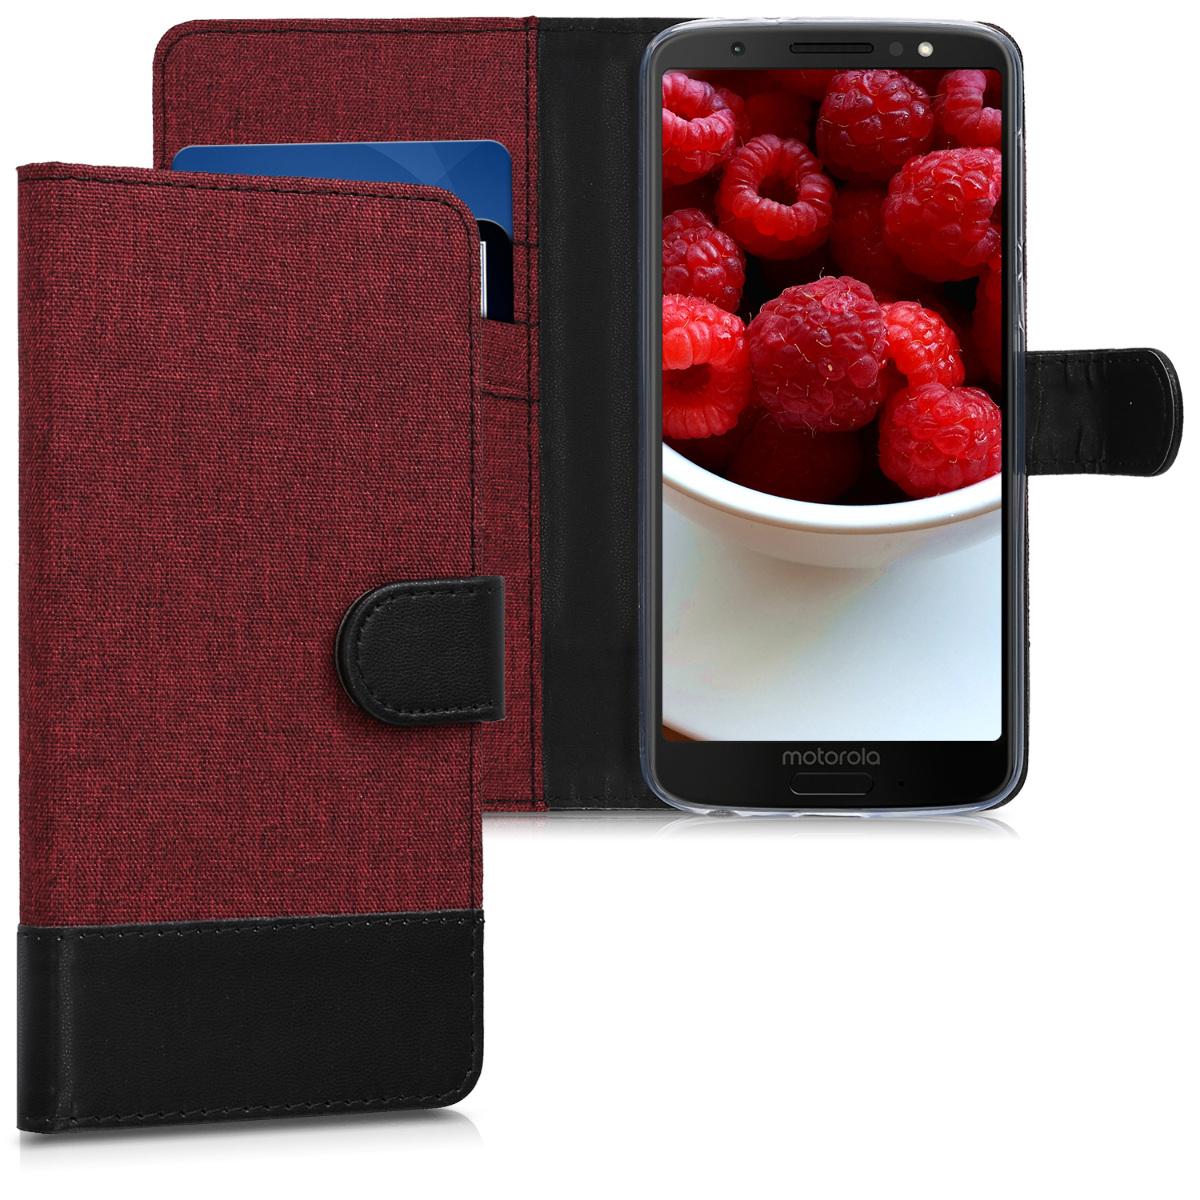 KW Θήκη Πορτοφόλι Motorola Moto G6 - Dark Red / Black Canvas (44603.03)